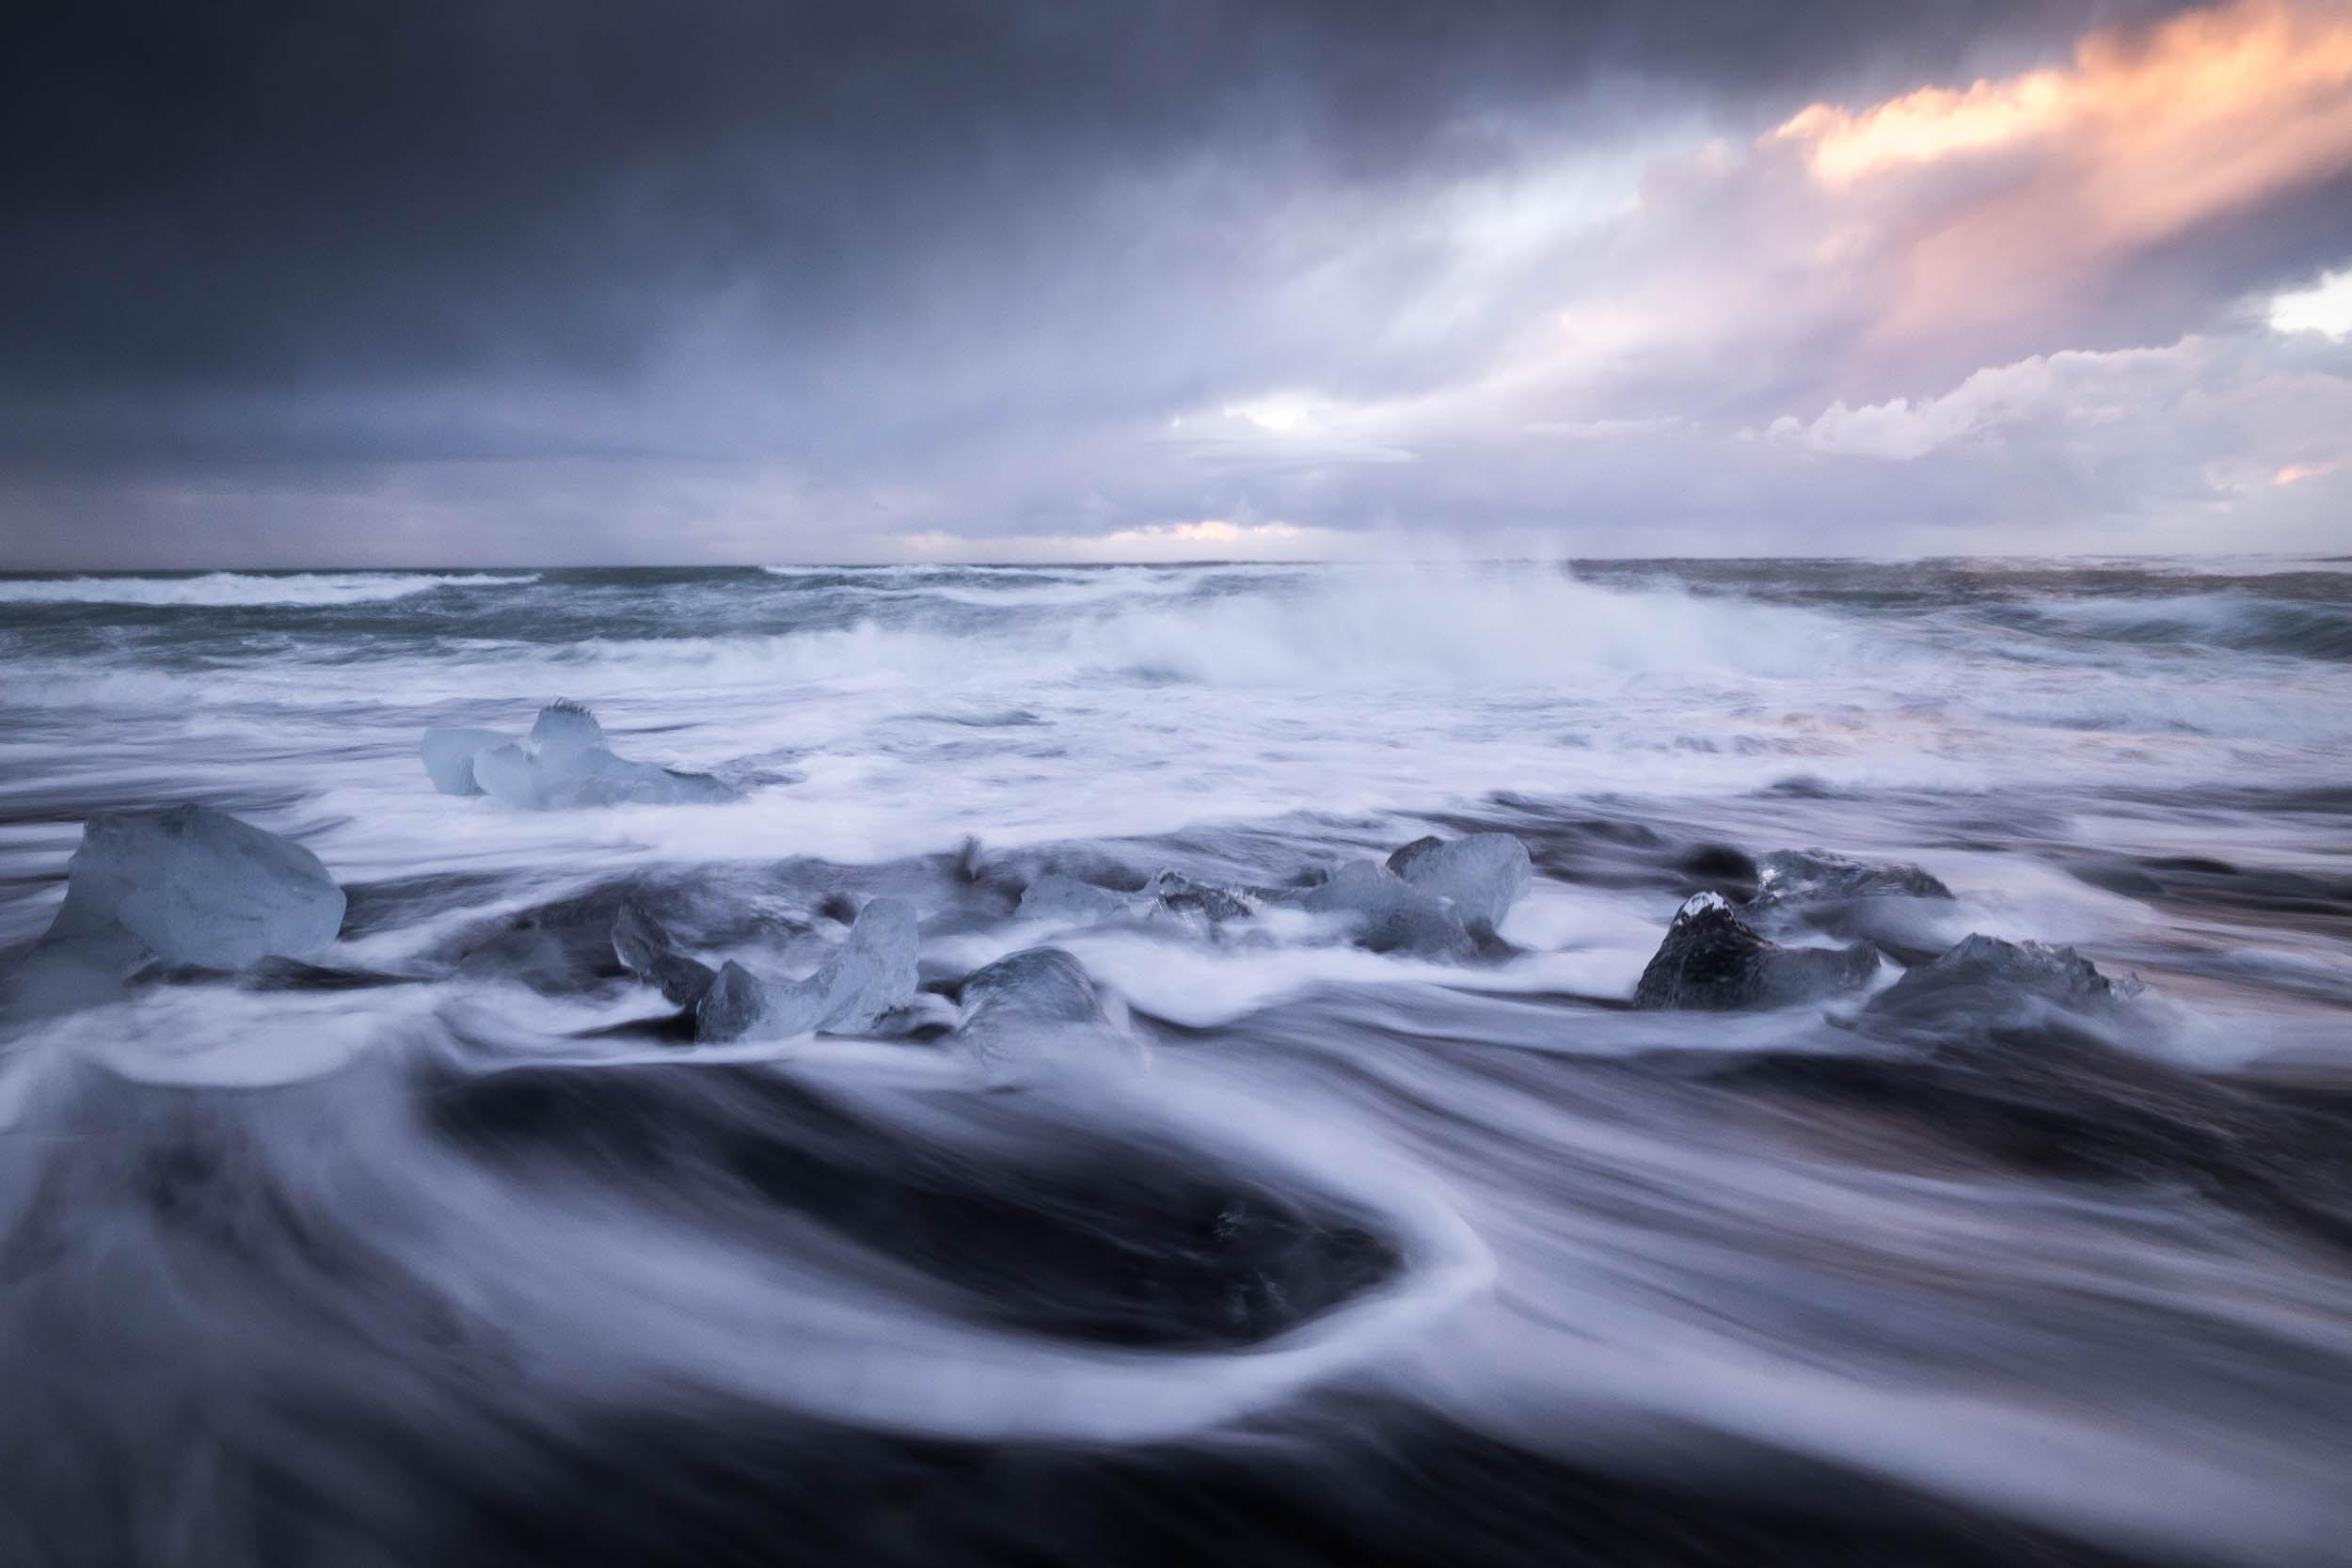 A cloudy sunrise above splashing sea waves in Jökulsárlón